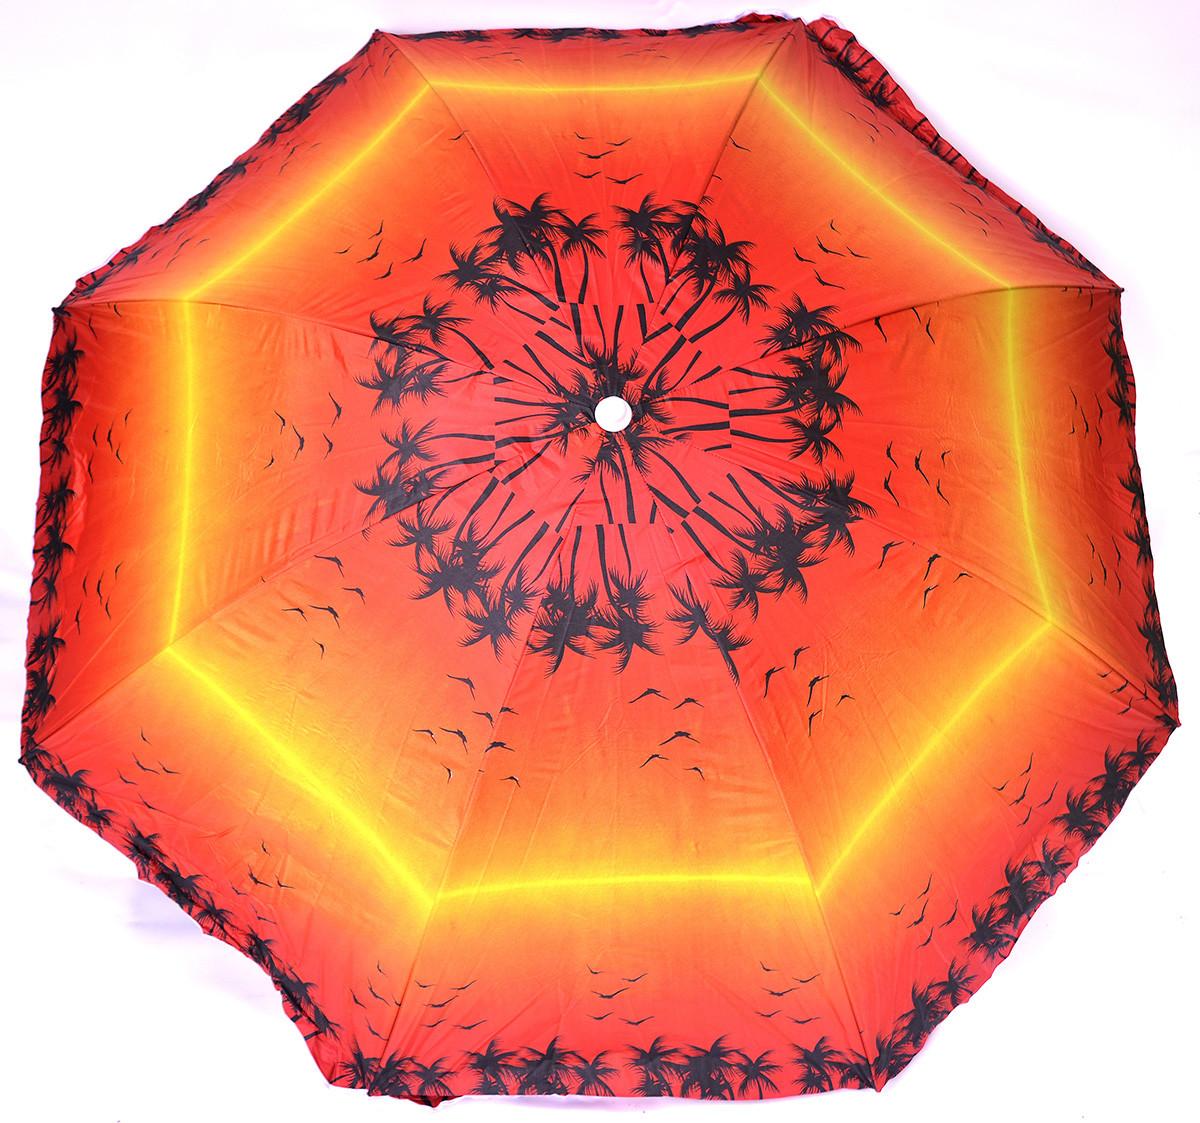 Пляжный зонт от солнца 2.2 м с наклоном система ромашка